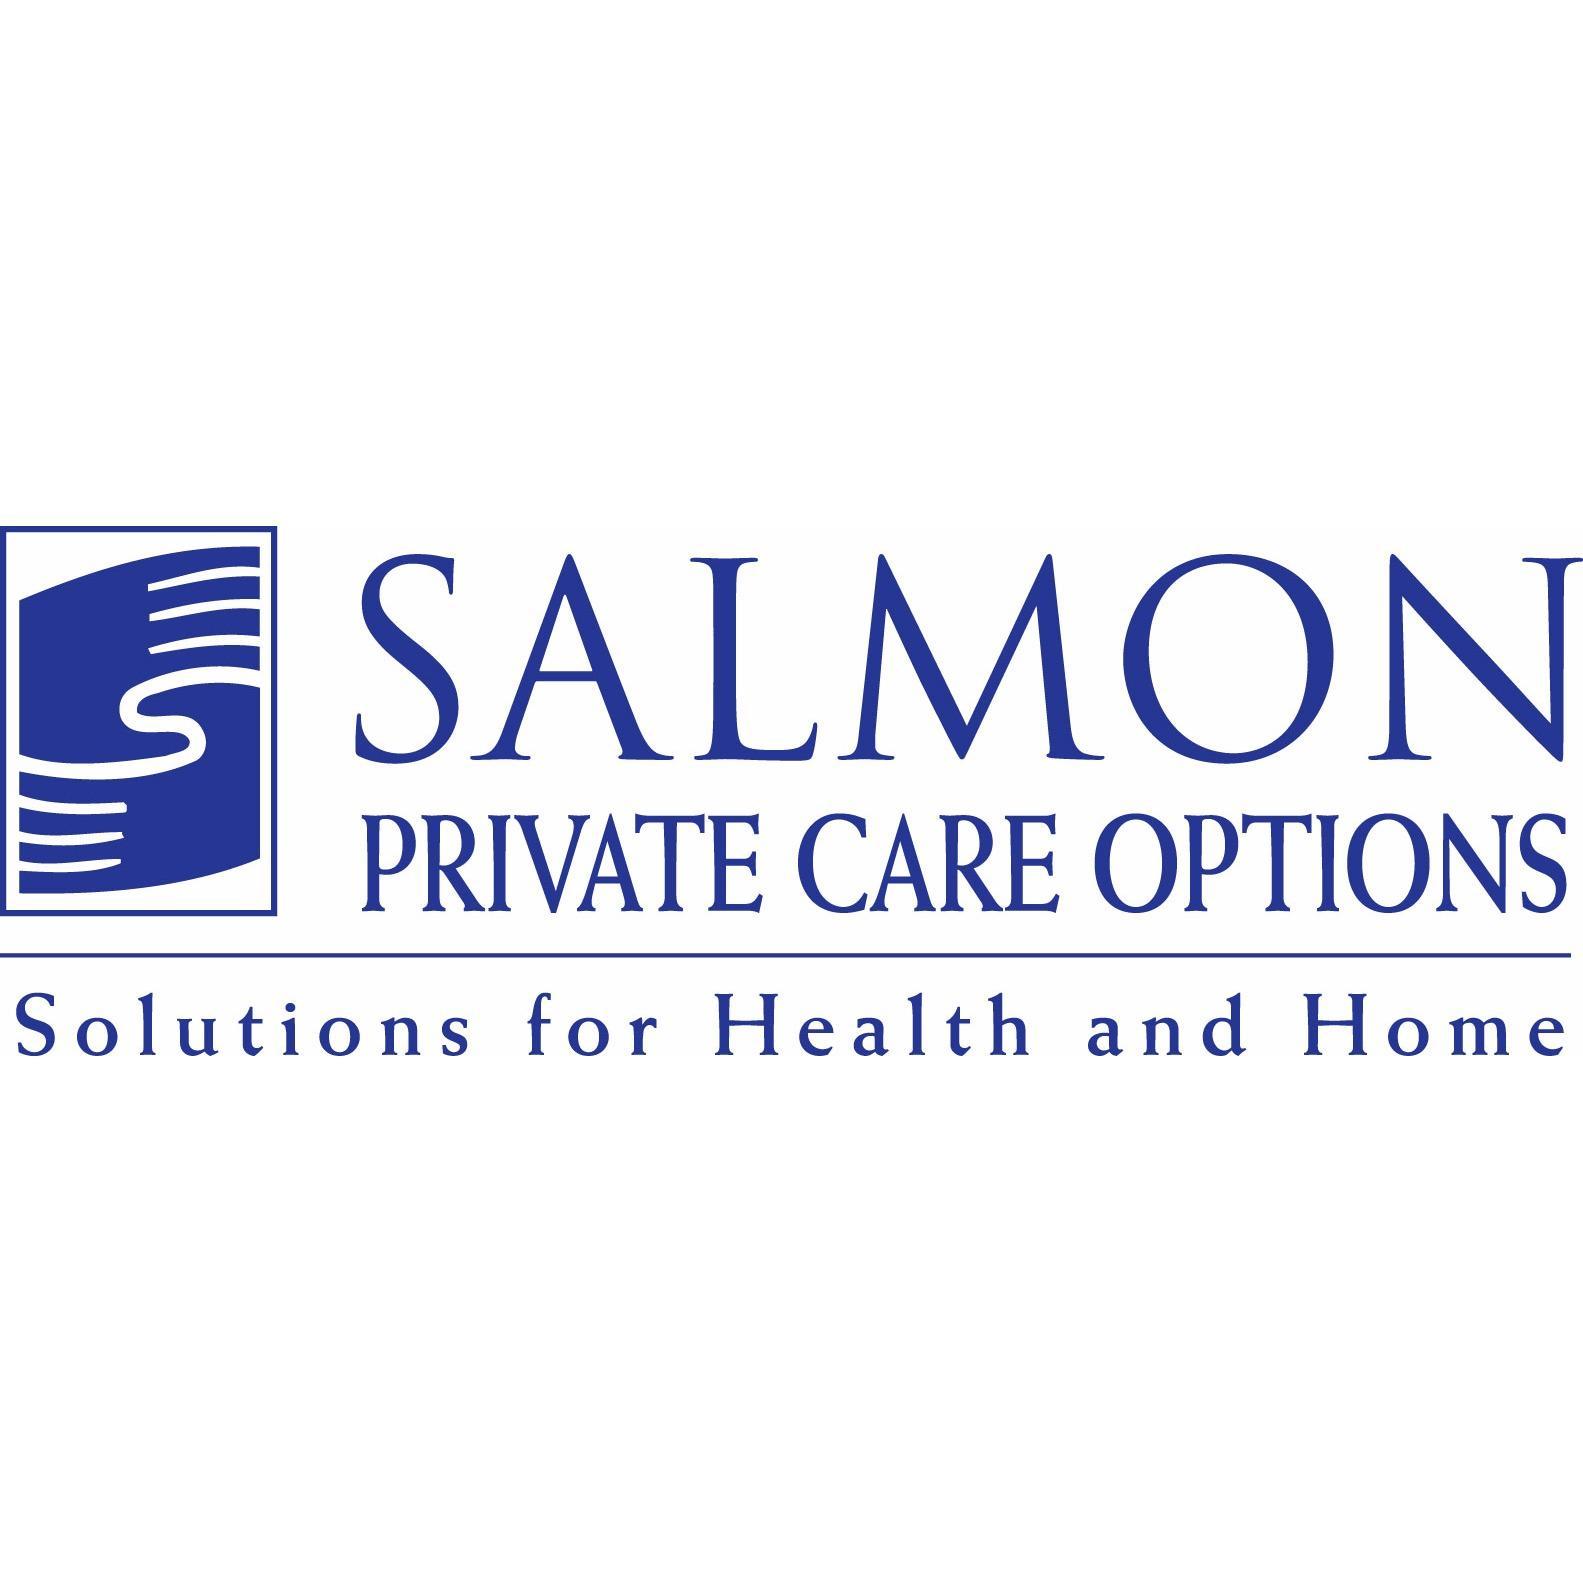 SALMON Private Care Options image 0